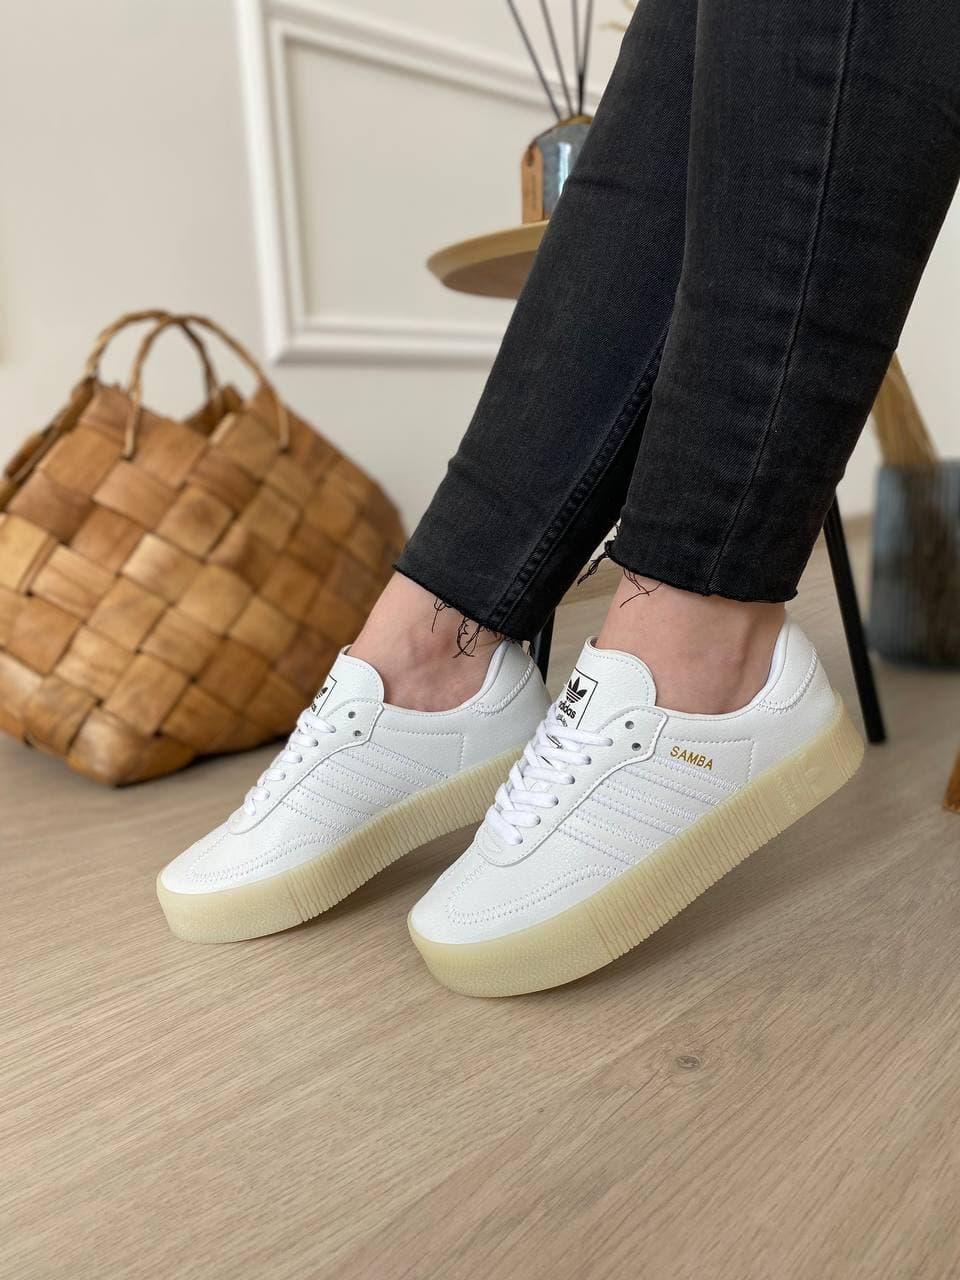 Женские кроссовки Adidas Samba White Brown Sole